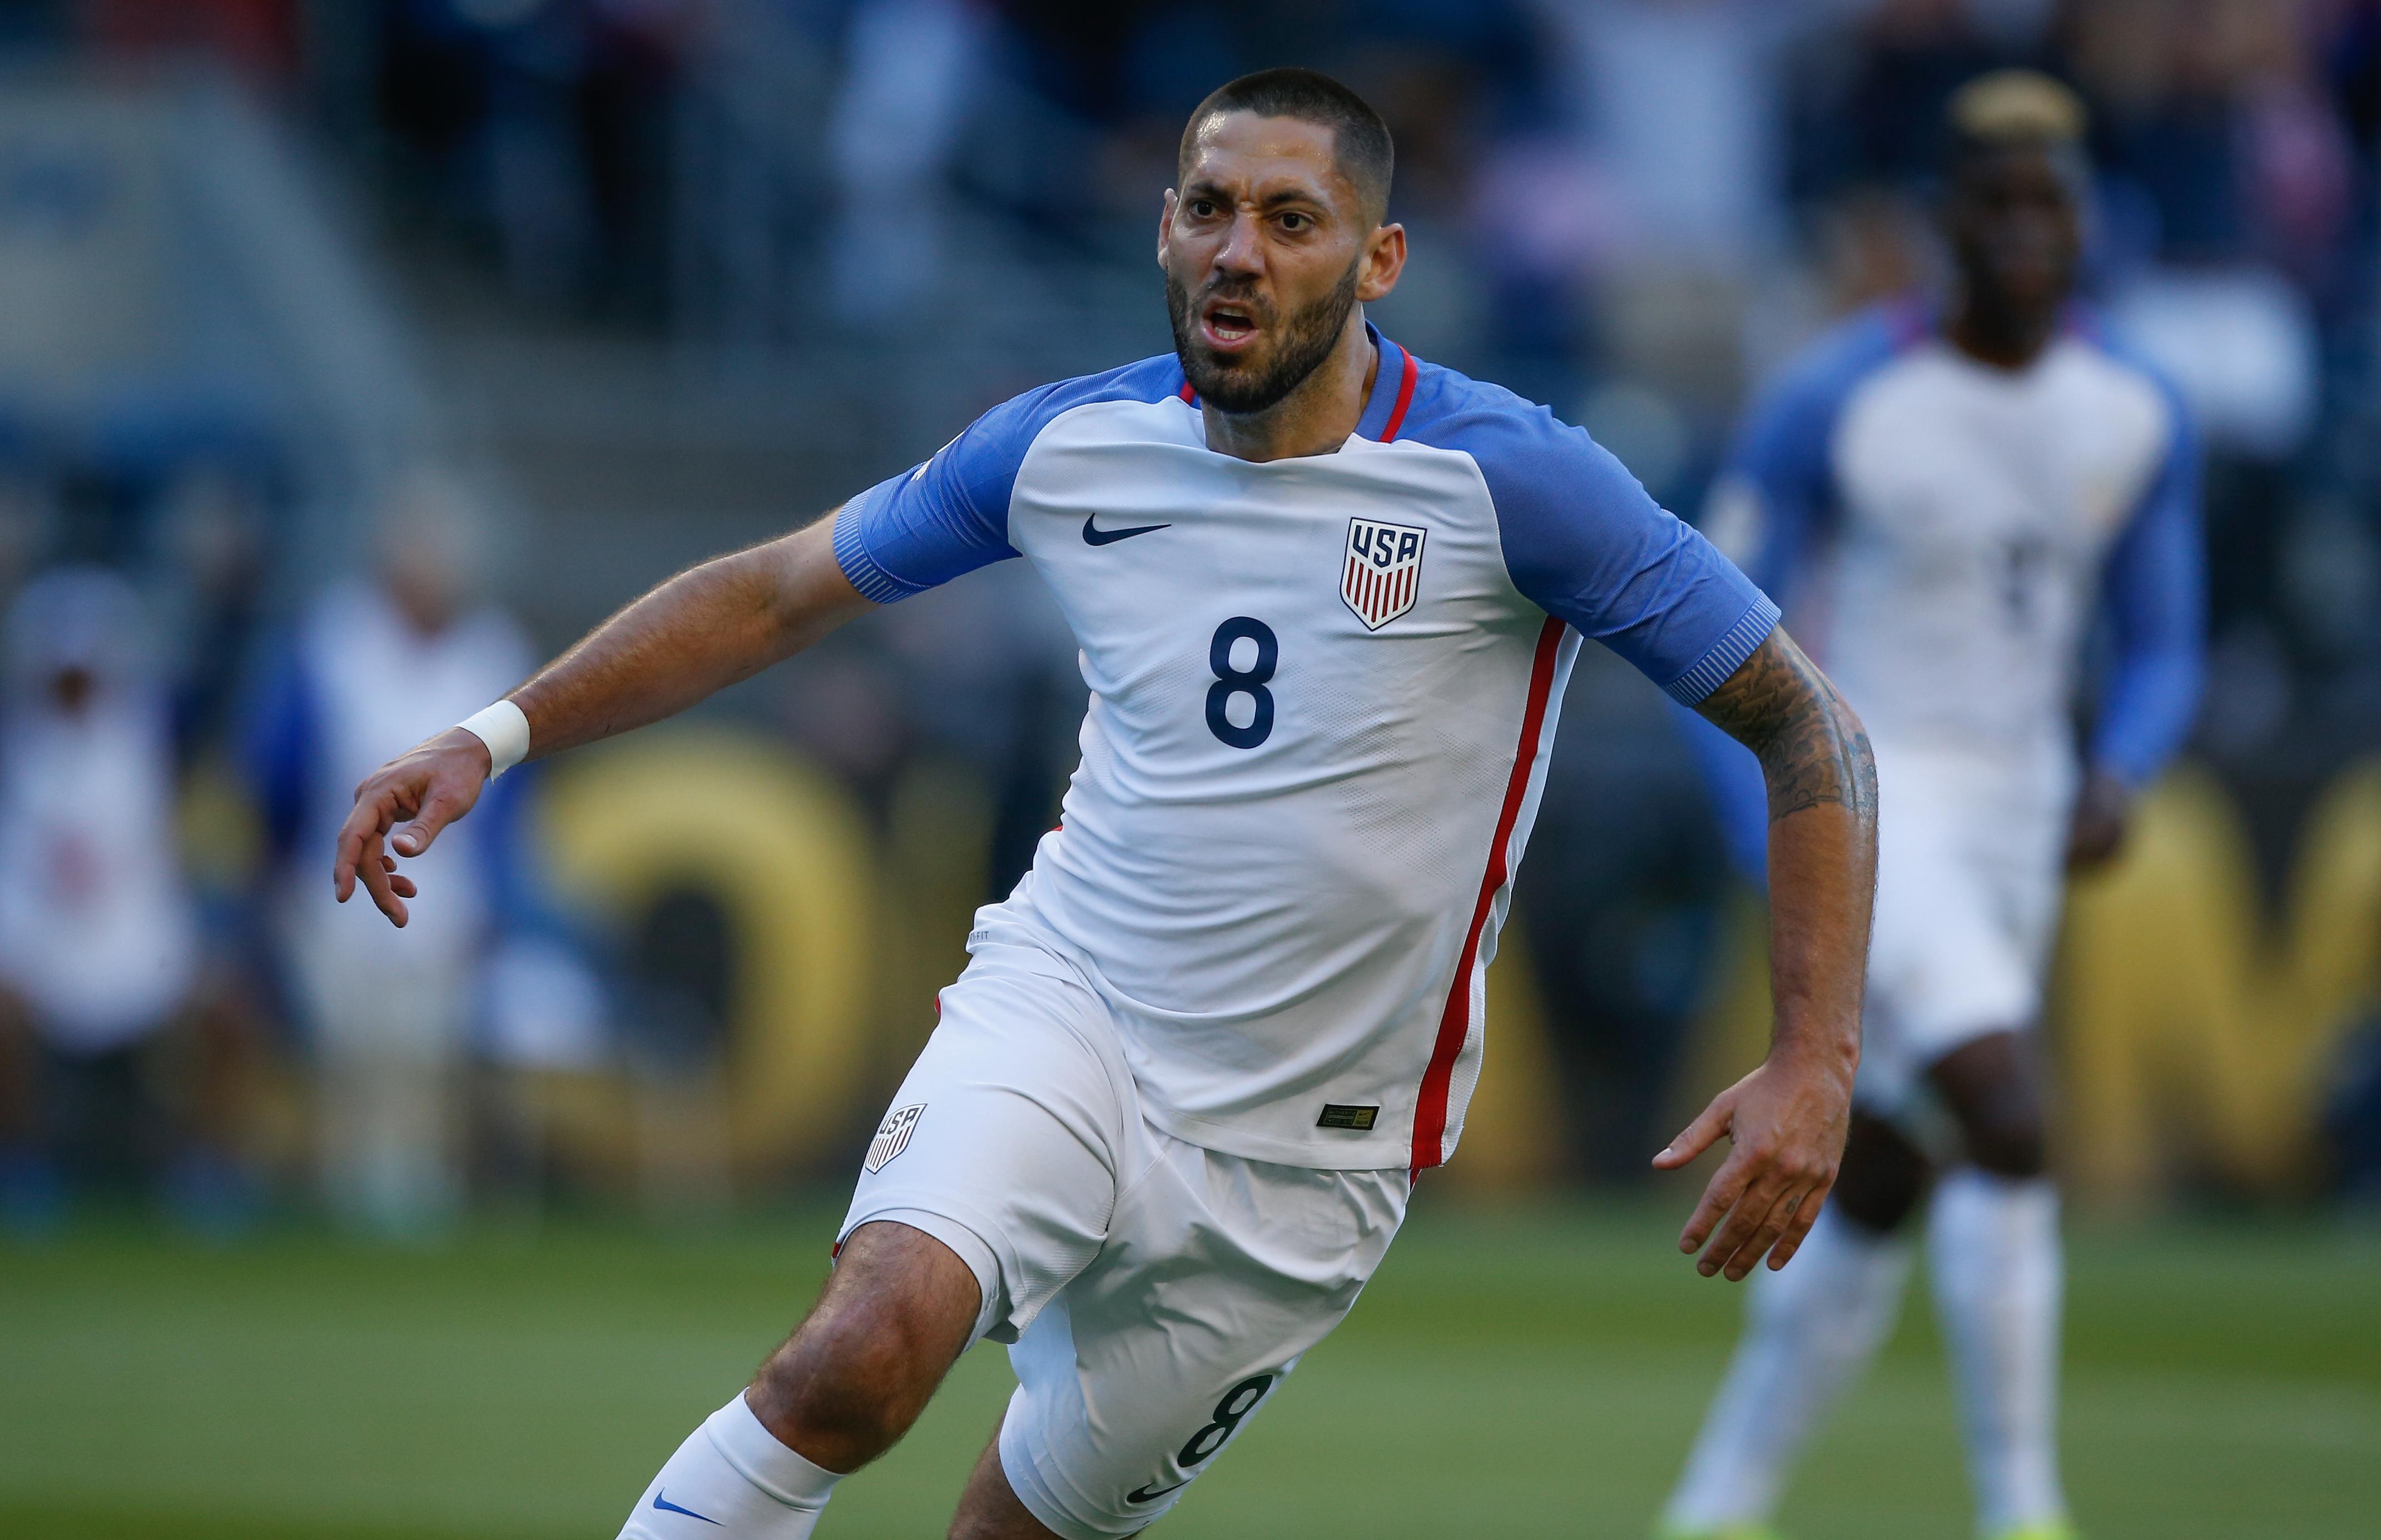 U.S. Men's National Team sees familiar faces returning to roster